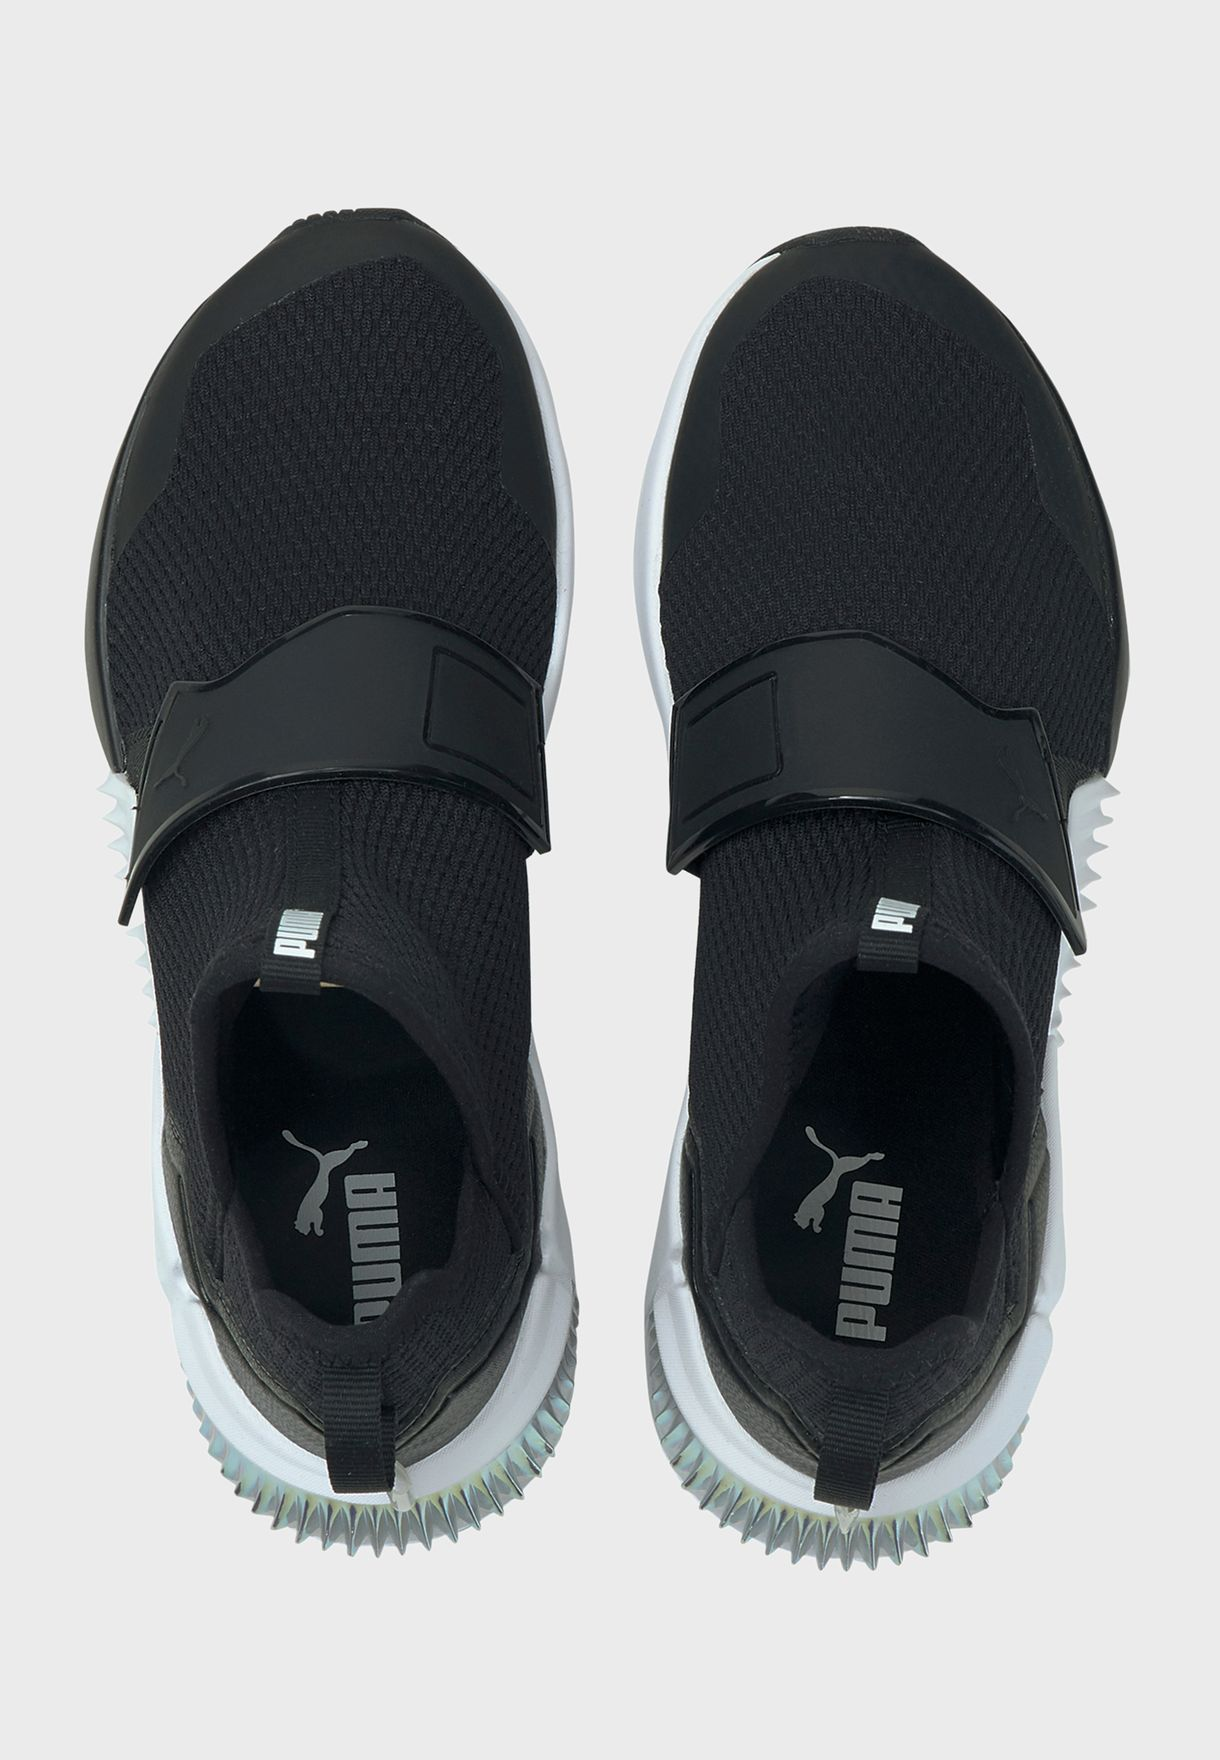 حذاء بروفوك اكس تي للنساء